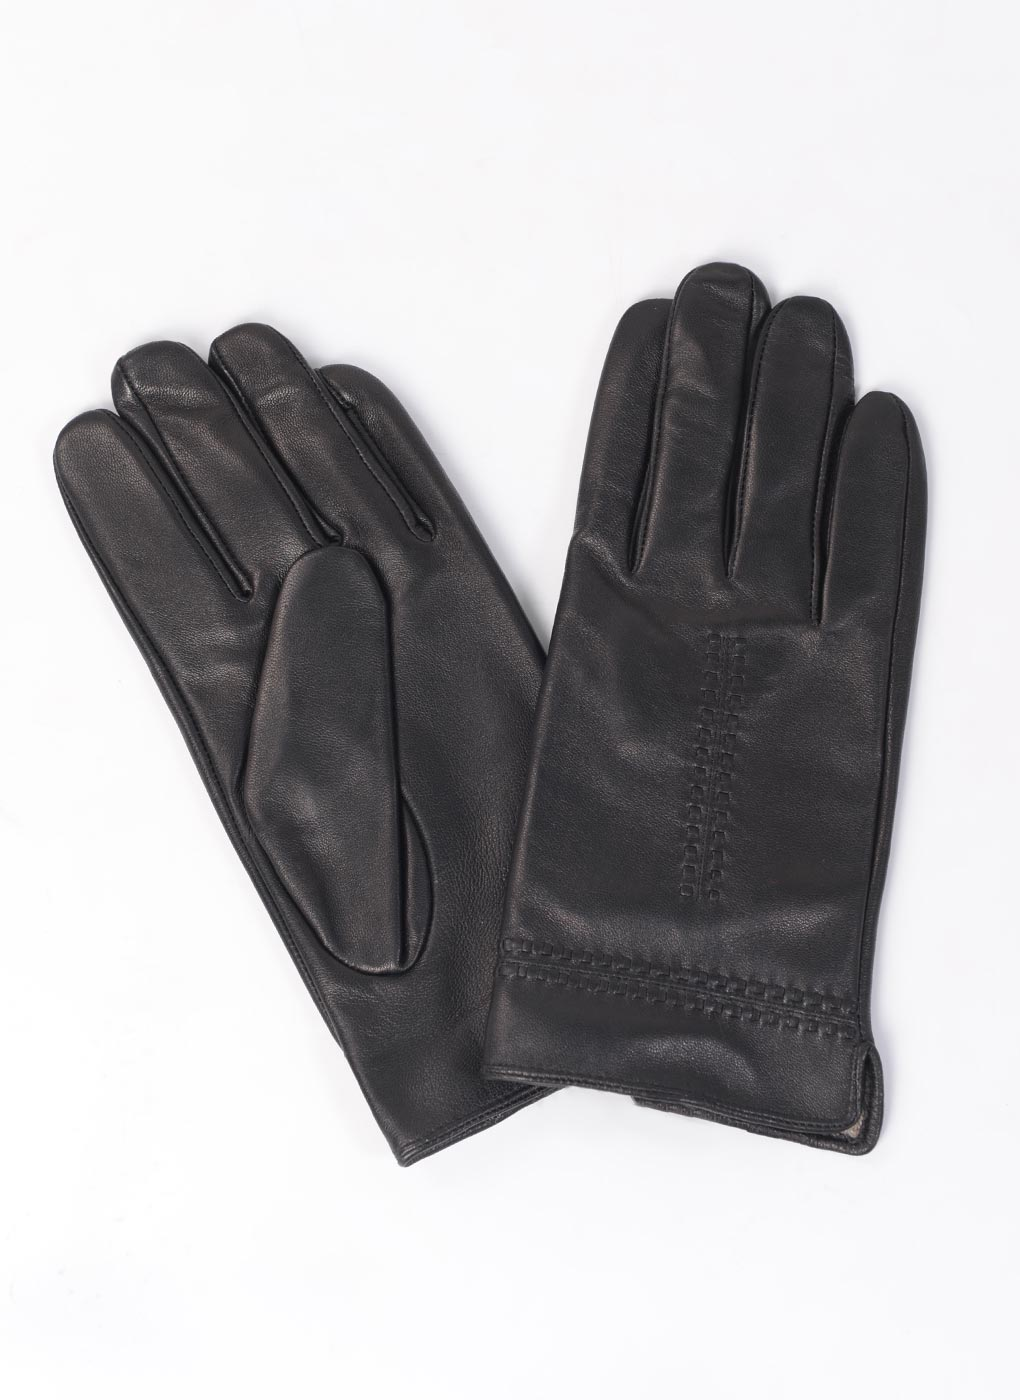 Перчатки кожаные мужские 04, YVONNE фото